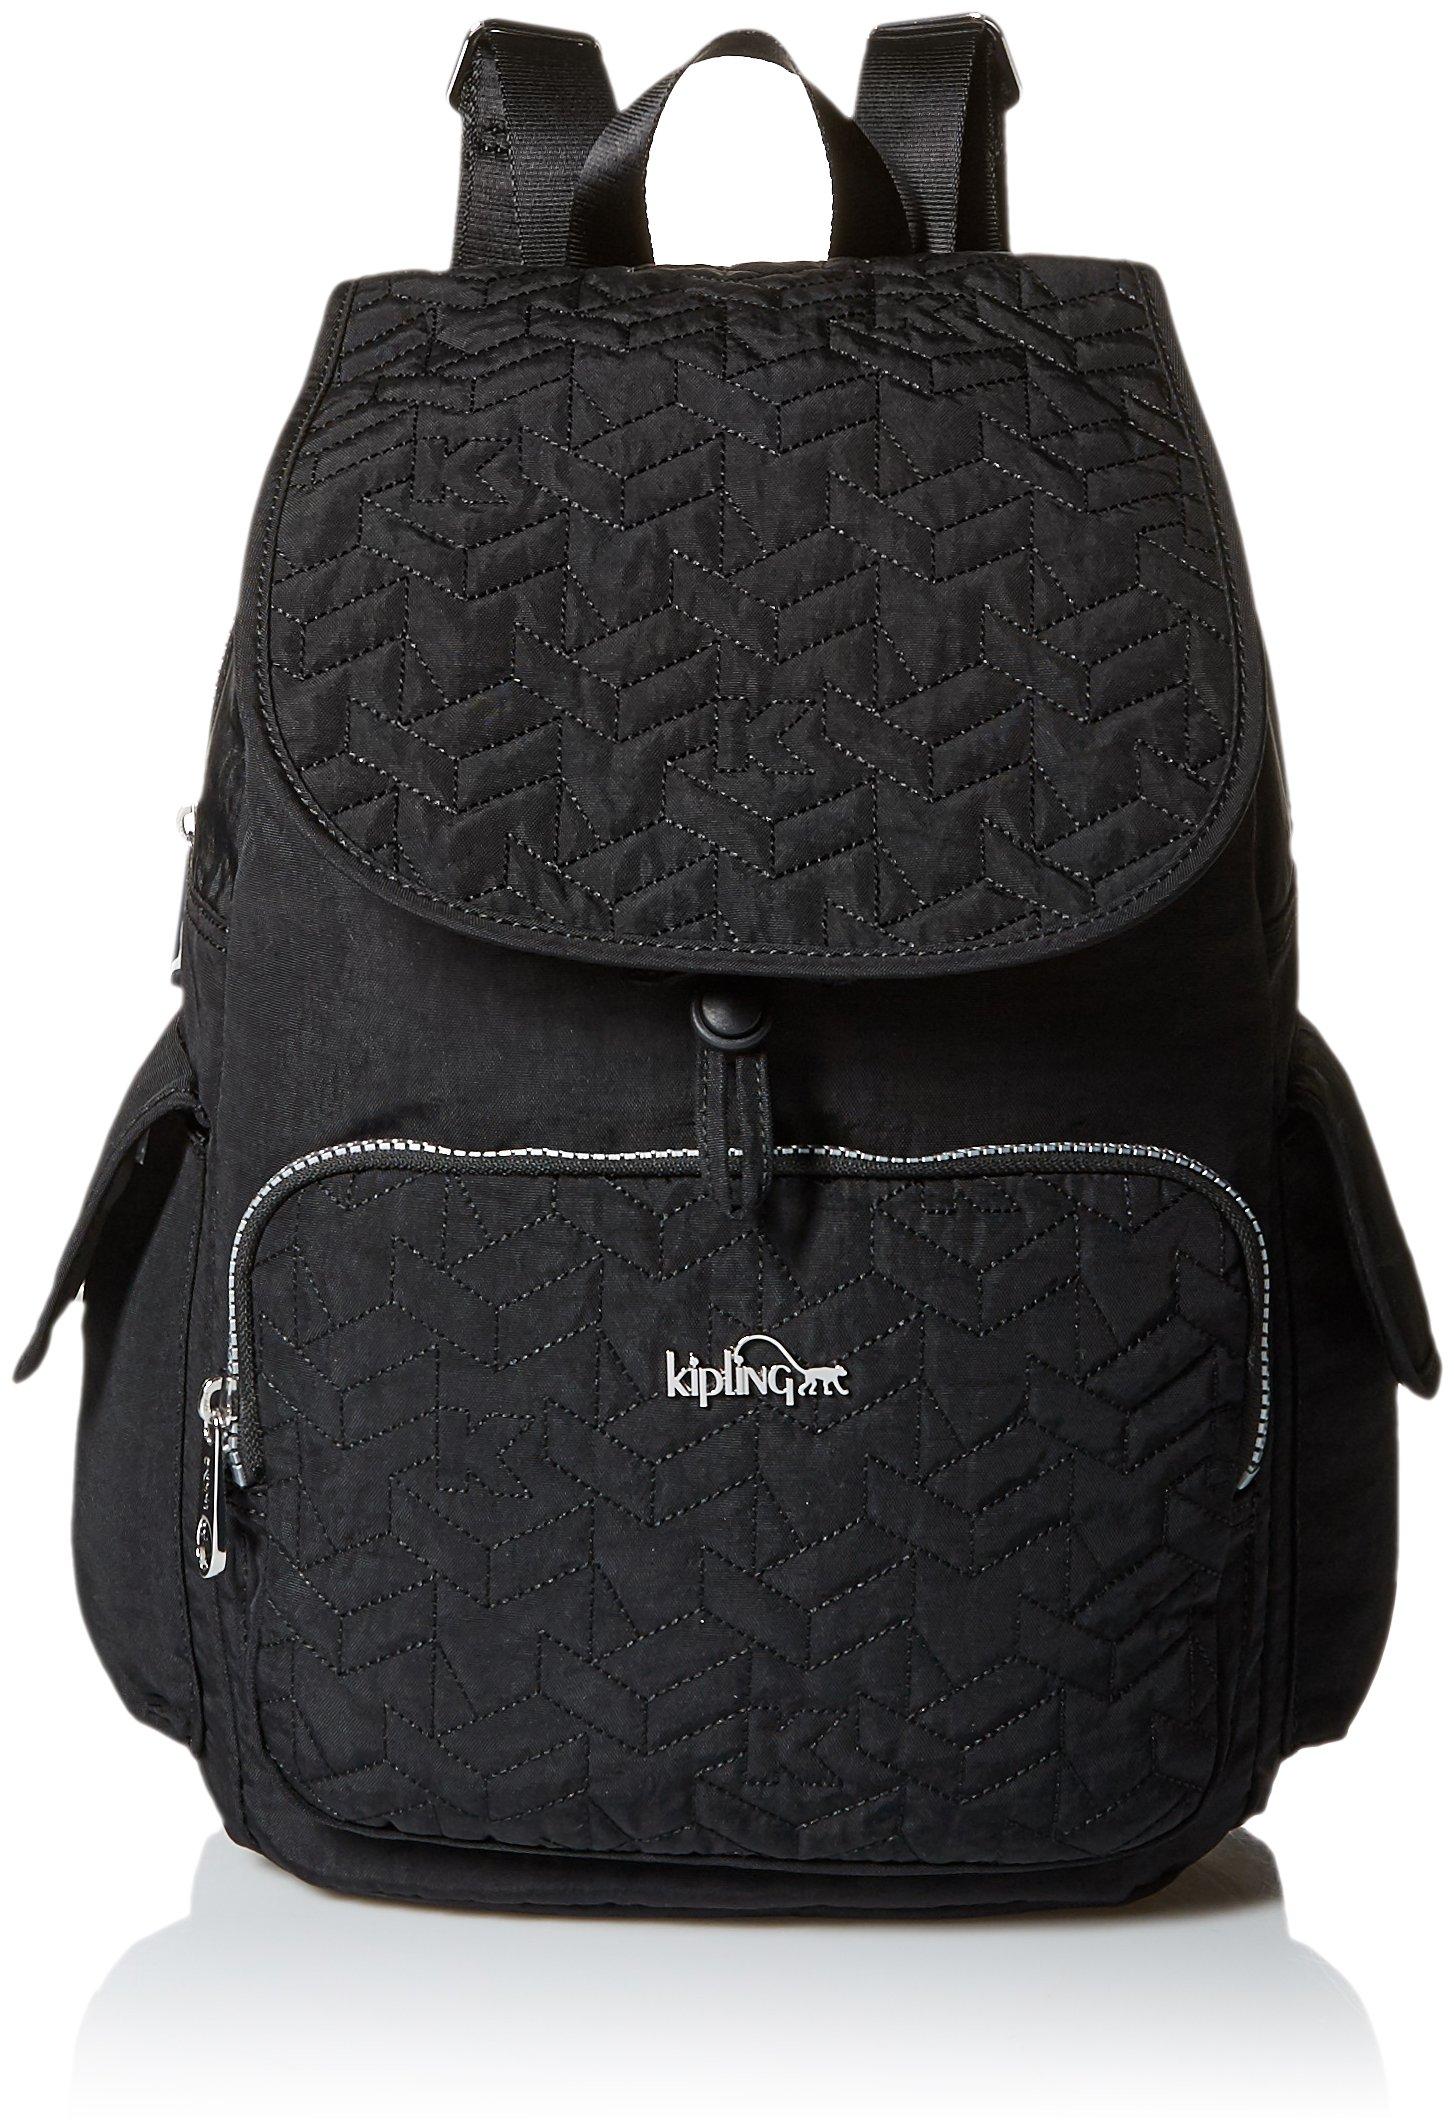 Kipling Women's Ravier Medium Solid Backpack, Black